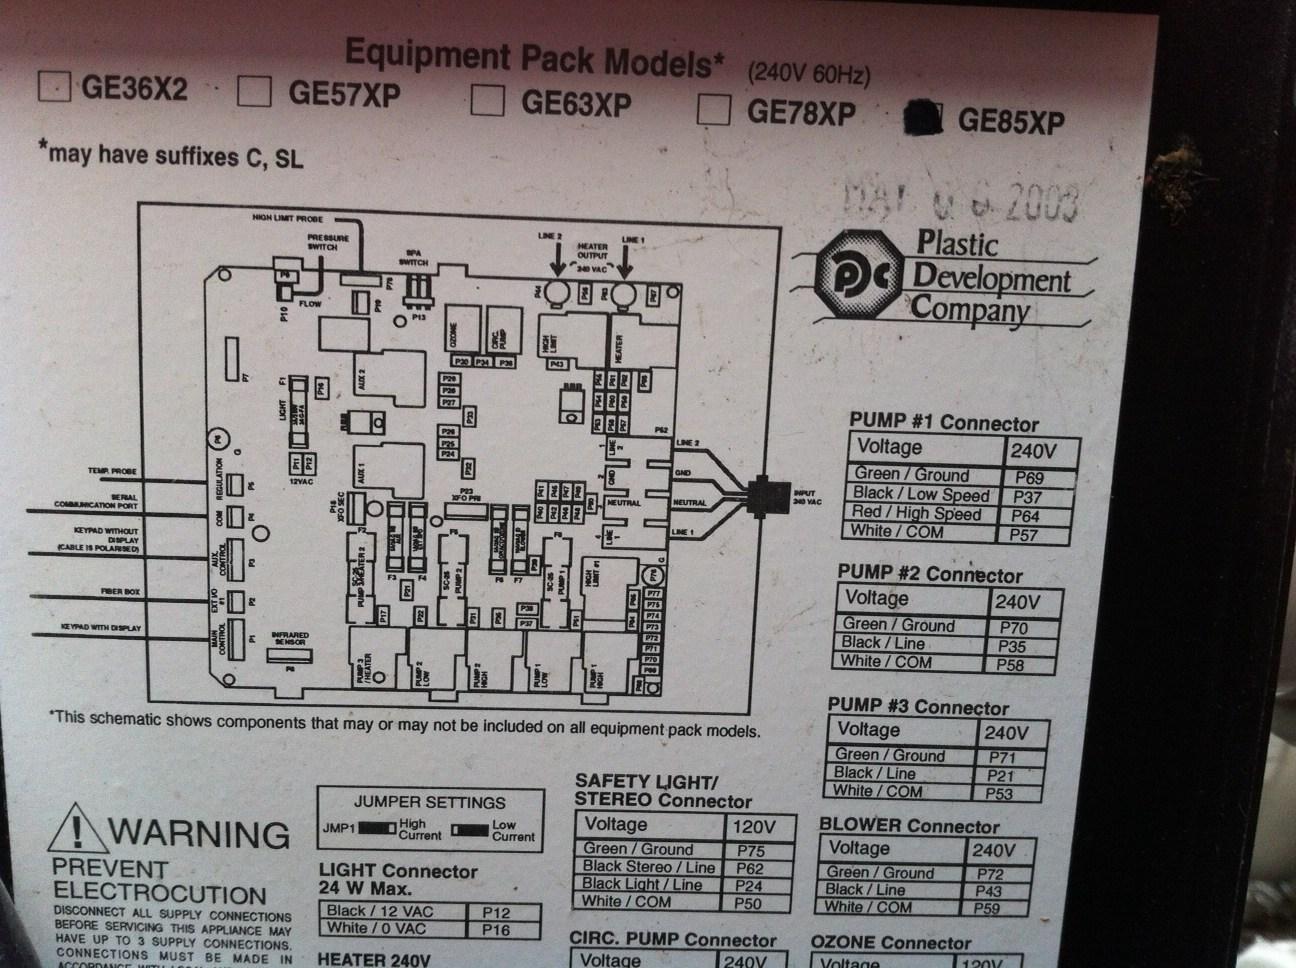 balboa spa pack wiring diagram 2000 mitsubishi montero gecko circuit board get free image about